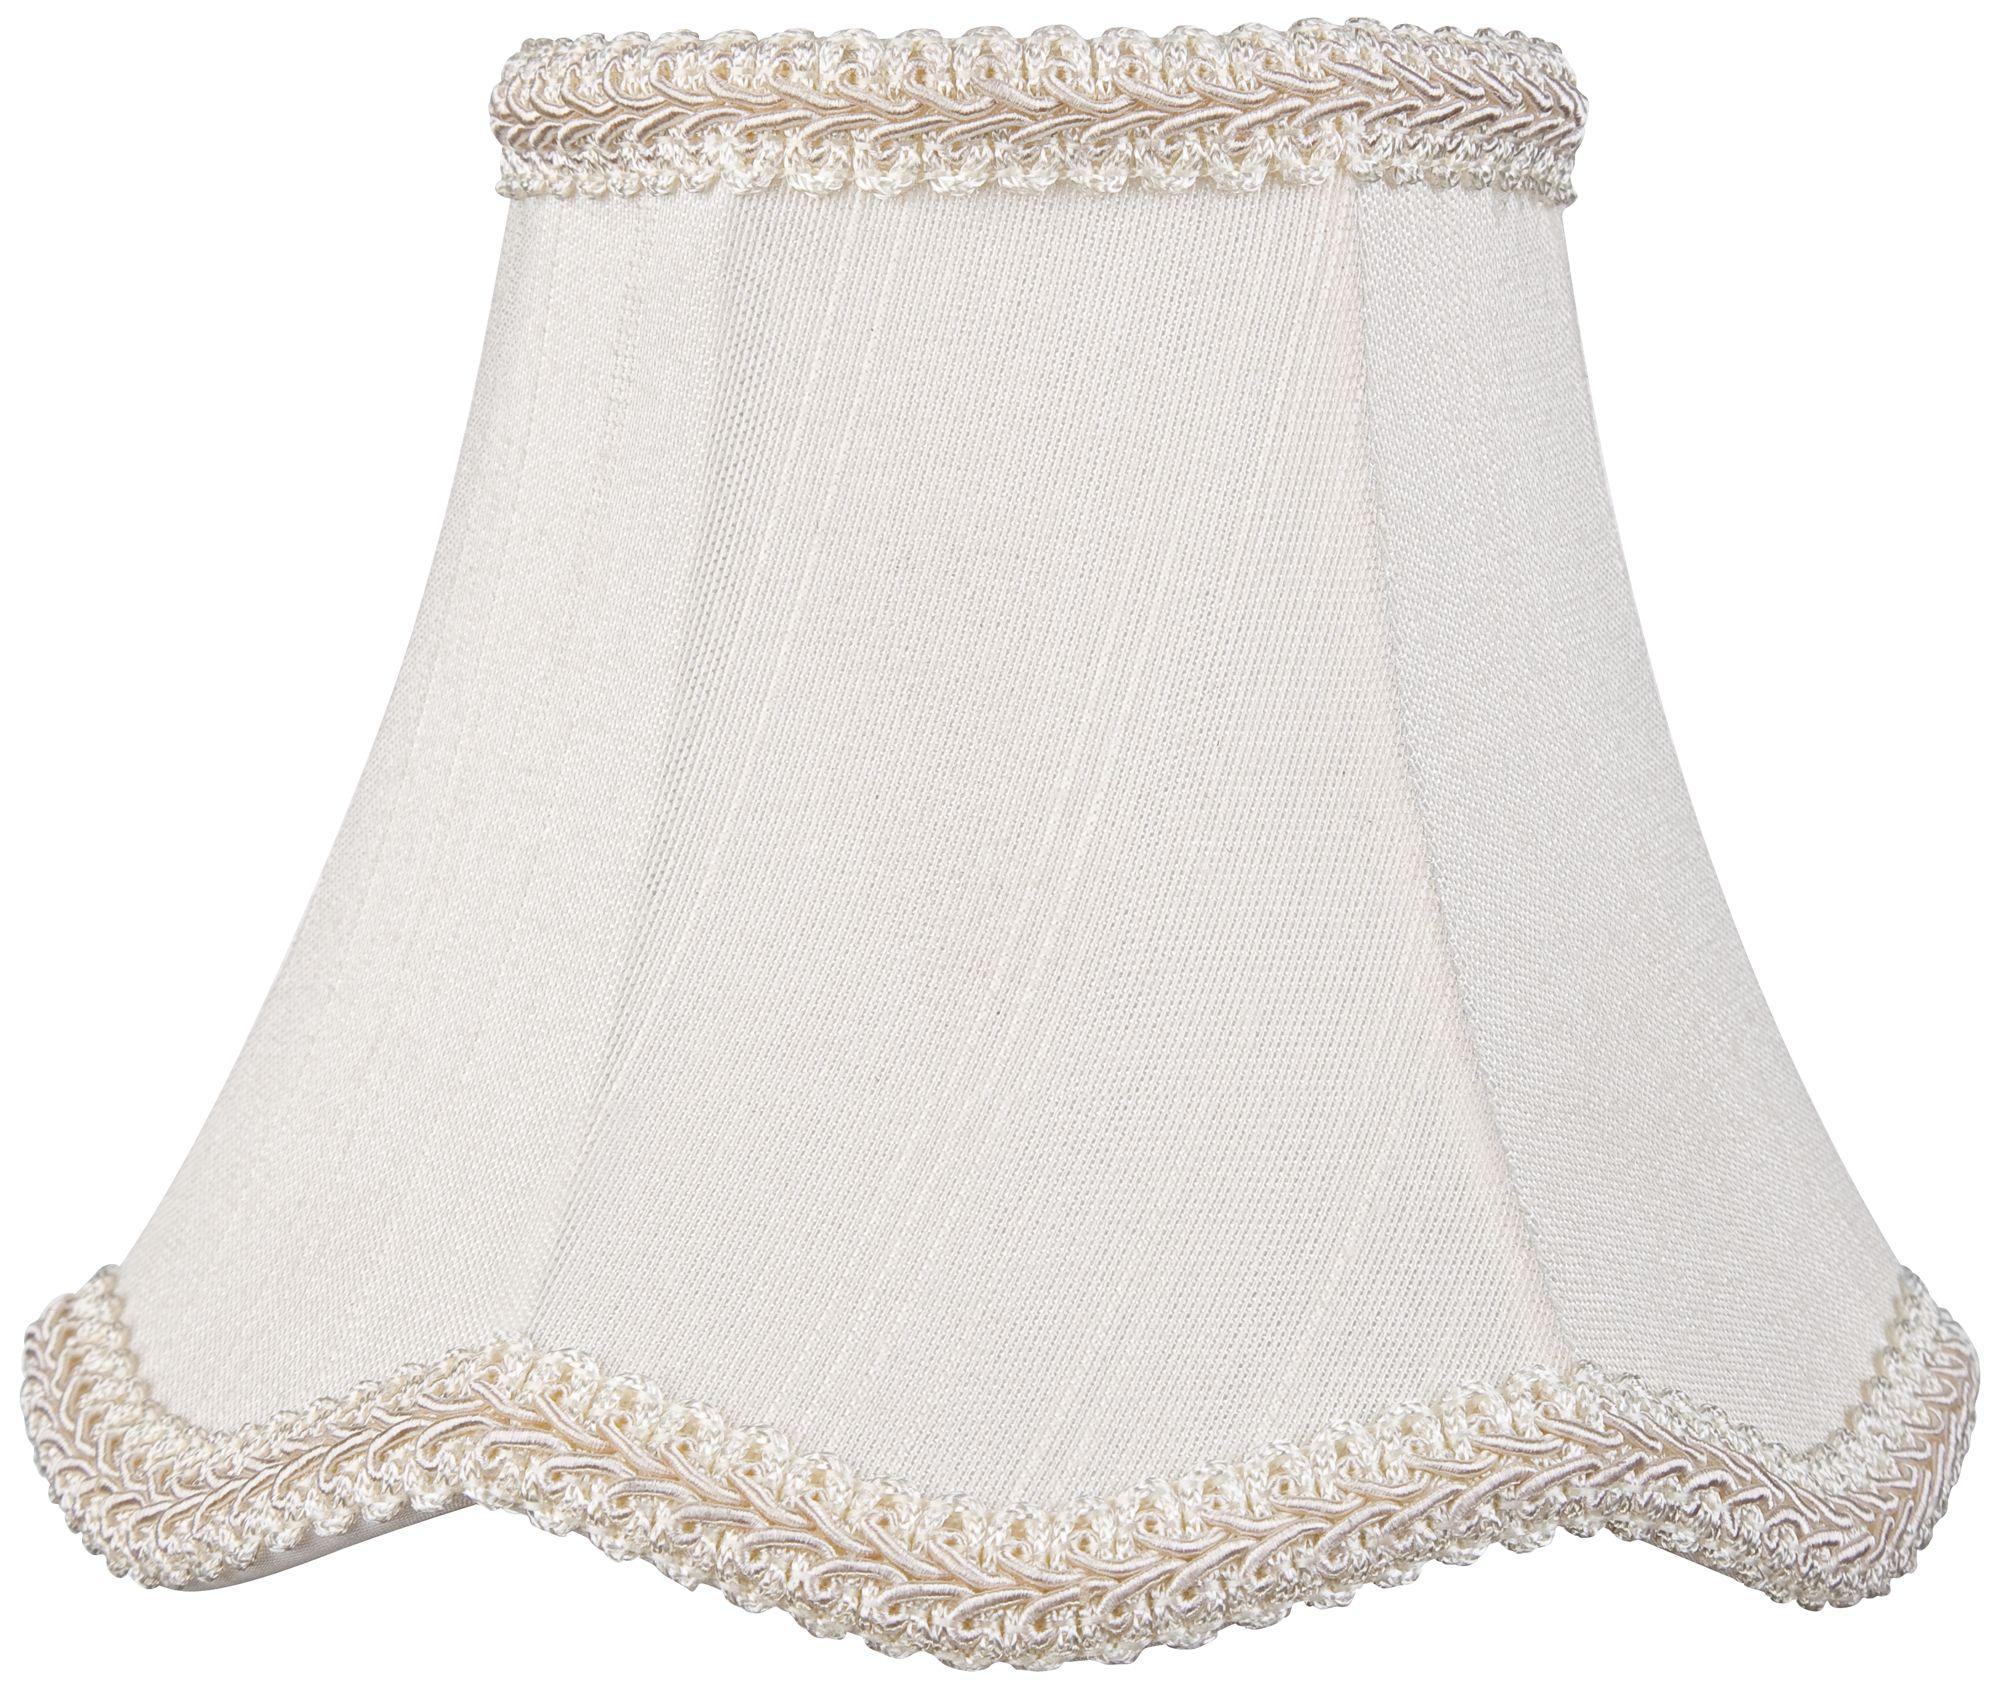 Scallop Cream Chandelier Lamp Shade 3x5.5x4.5 (Clip On)